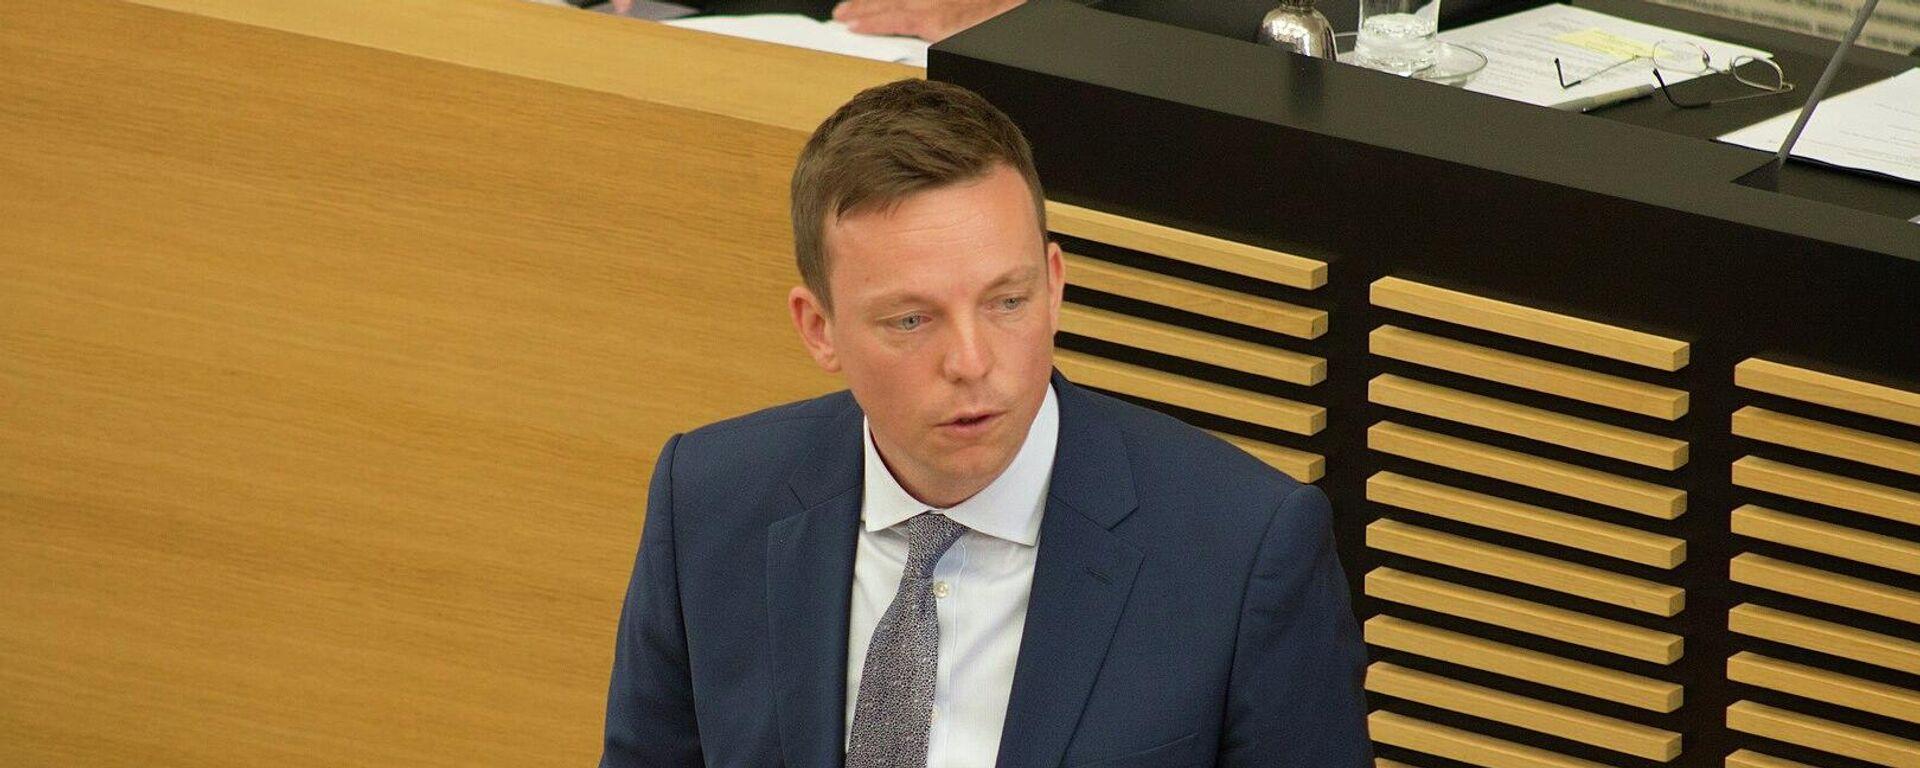 Saarlands Ministerpräsident Tobias Hans (Archivbild) - SNA, 1920, 20.09.2021